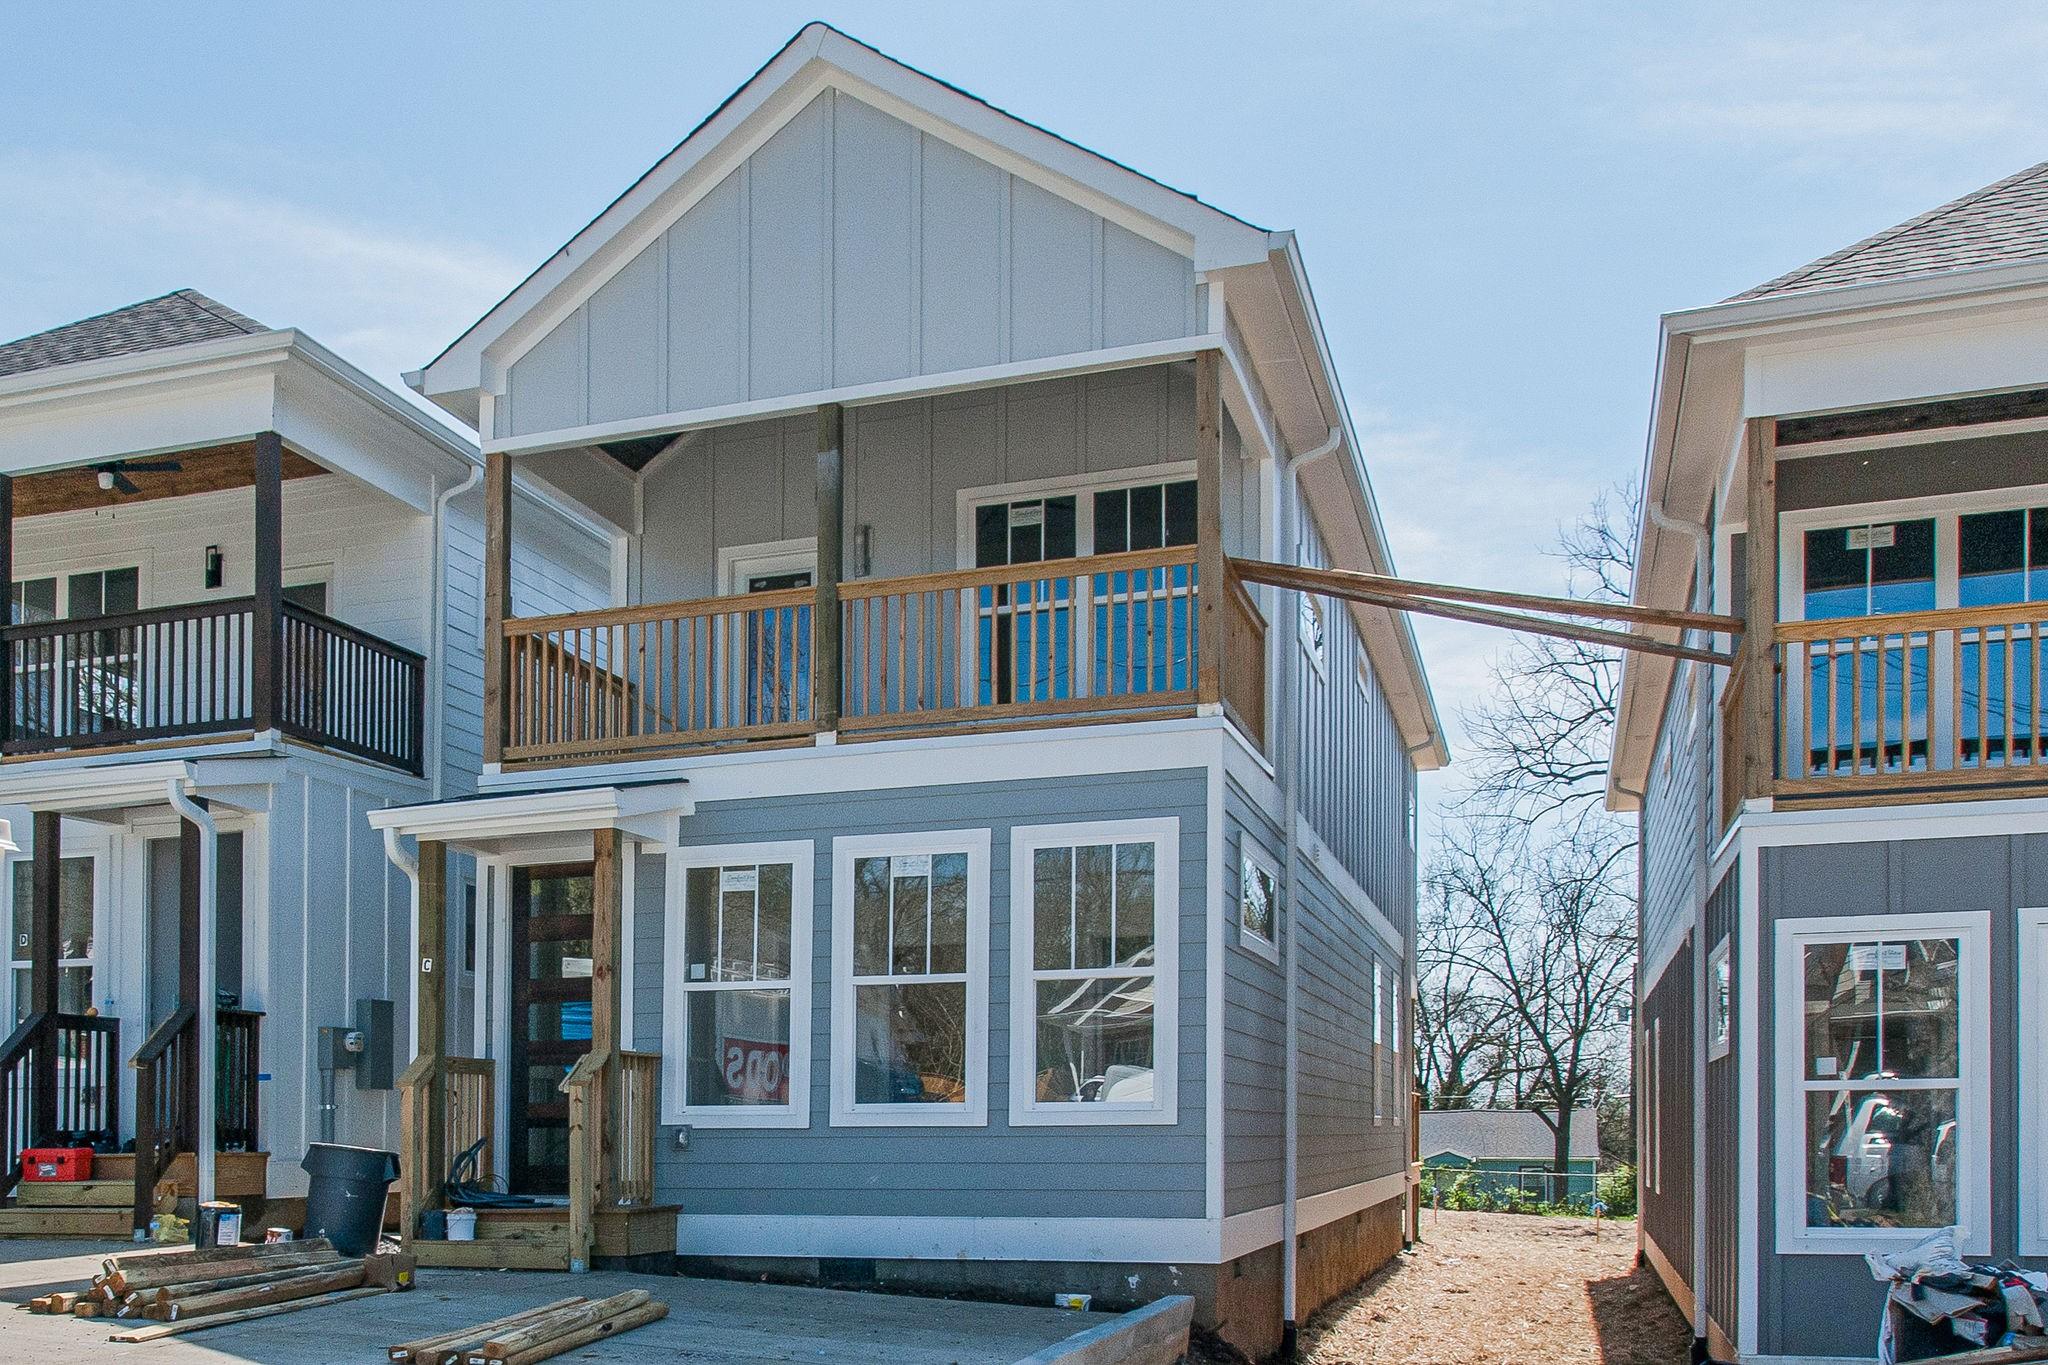 922C Elvira Ave, Nashville, TN 37216 - Nashville, TN real estate listing